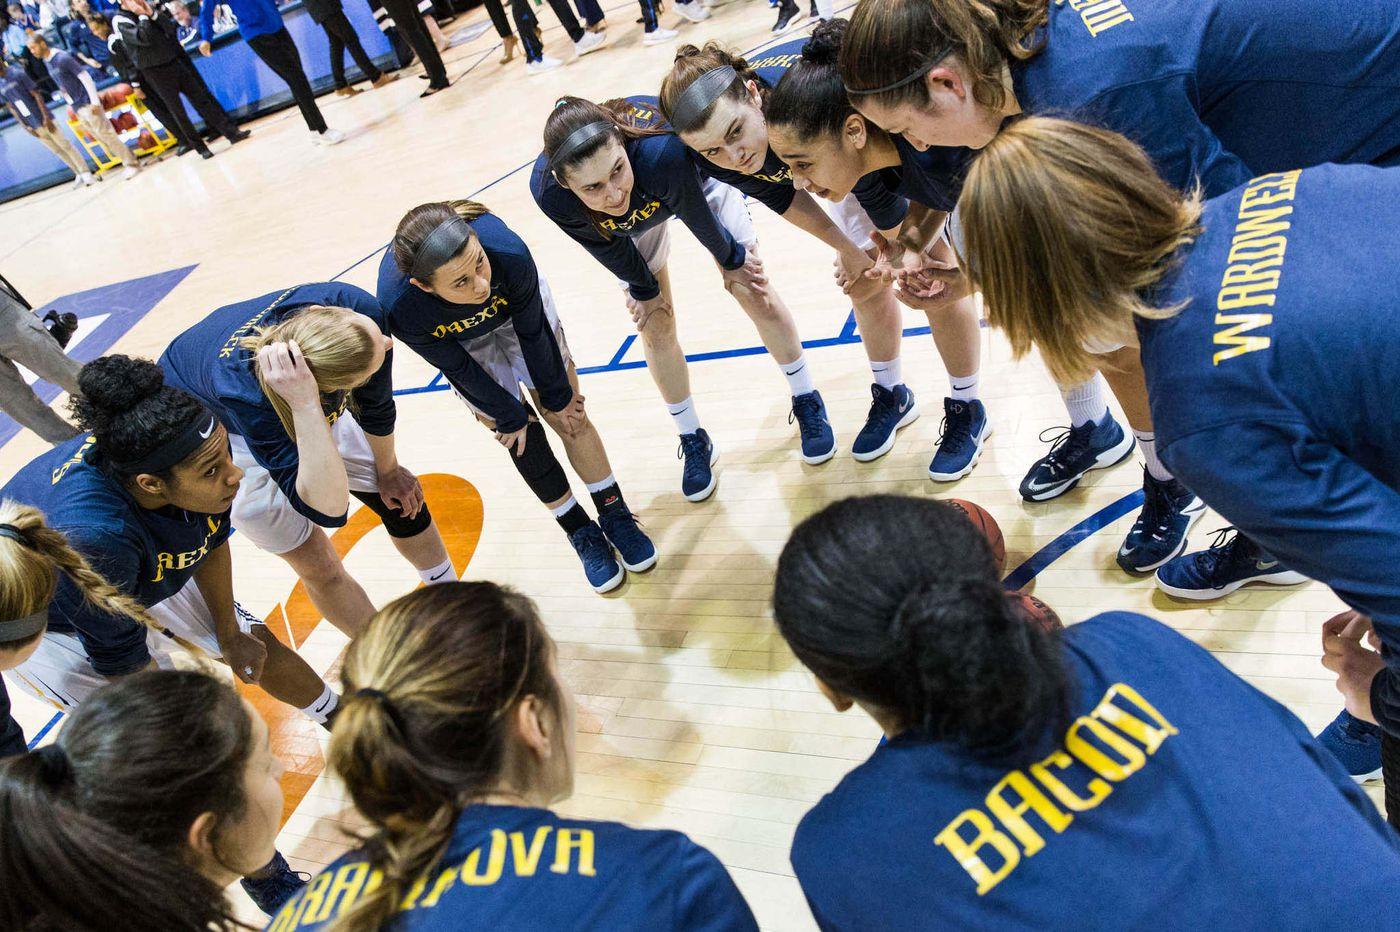 Drexel women lose to Towson in CAA women's basketball final